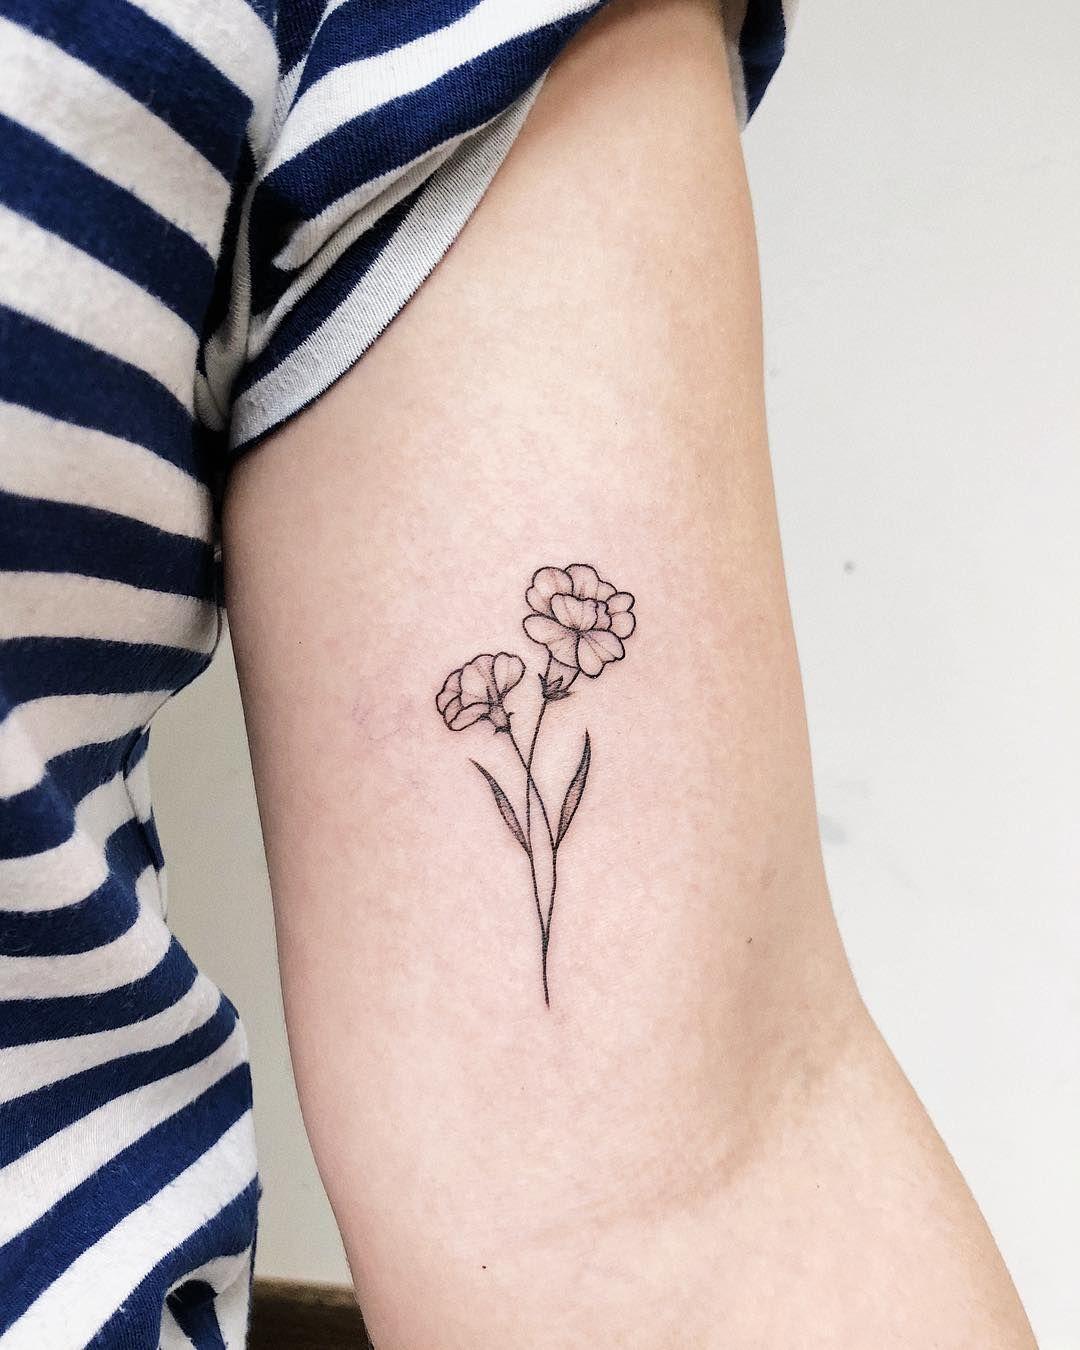 Kate On Instagram Carnations For Cynthia Carnation Tattoo Autumn Tattoo Mum Tattoo